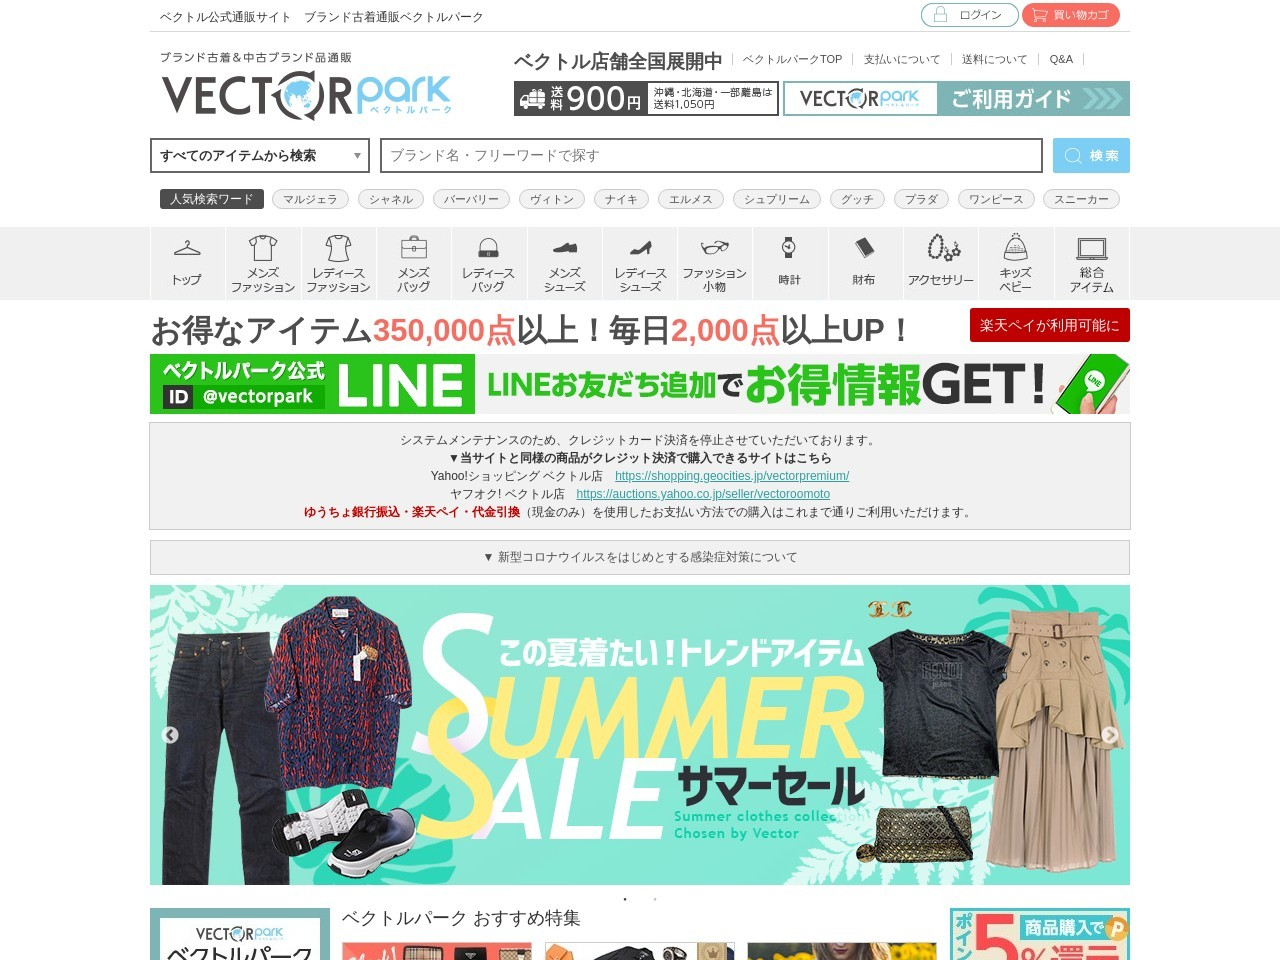 http://vector-park.jp/list/?kw=Reebok&cgt1=&send_sid=1